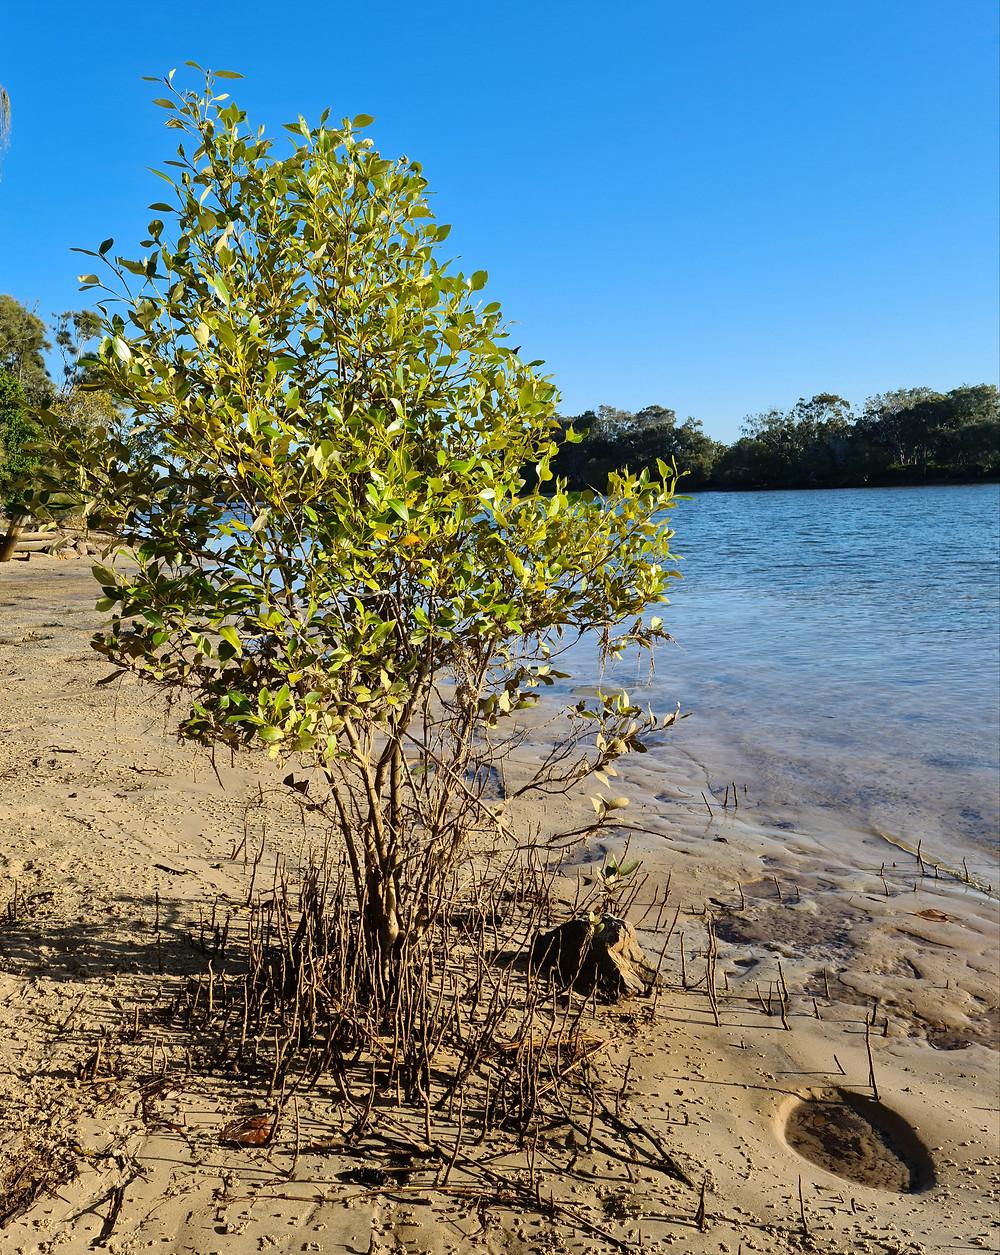 Mangrove next to river estuary with potholes of mud